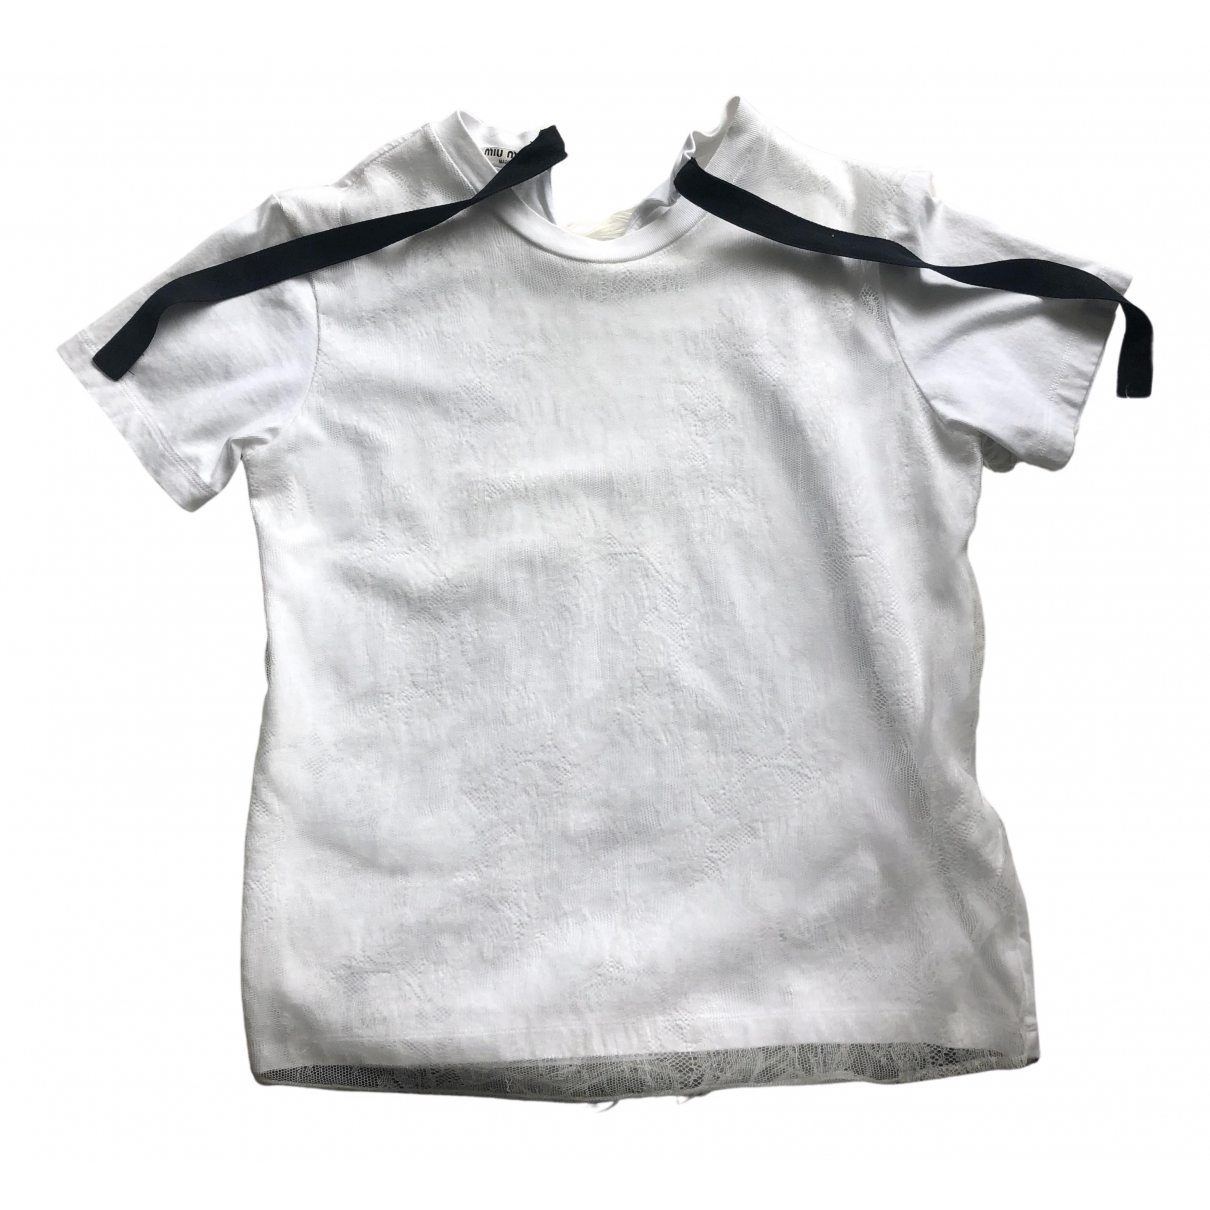 Miu Miu \N White Cotton  top for Women S International